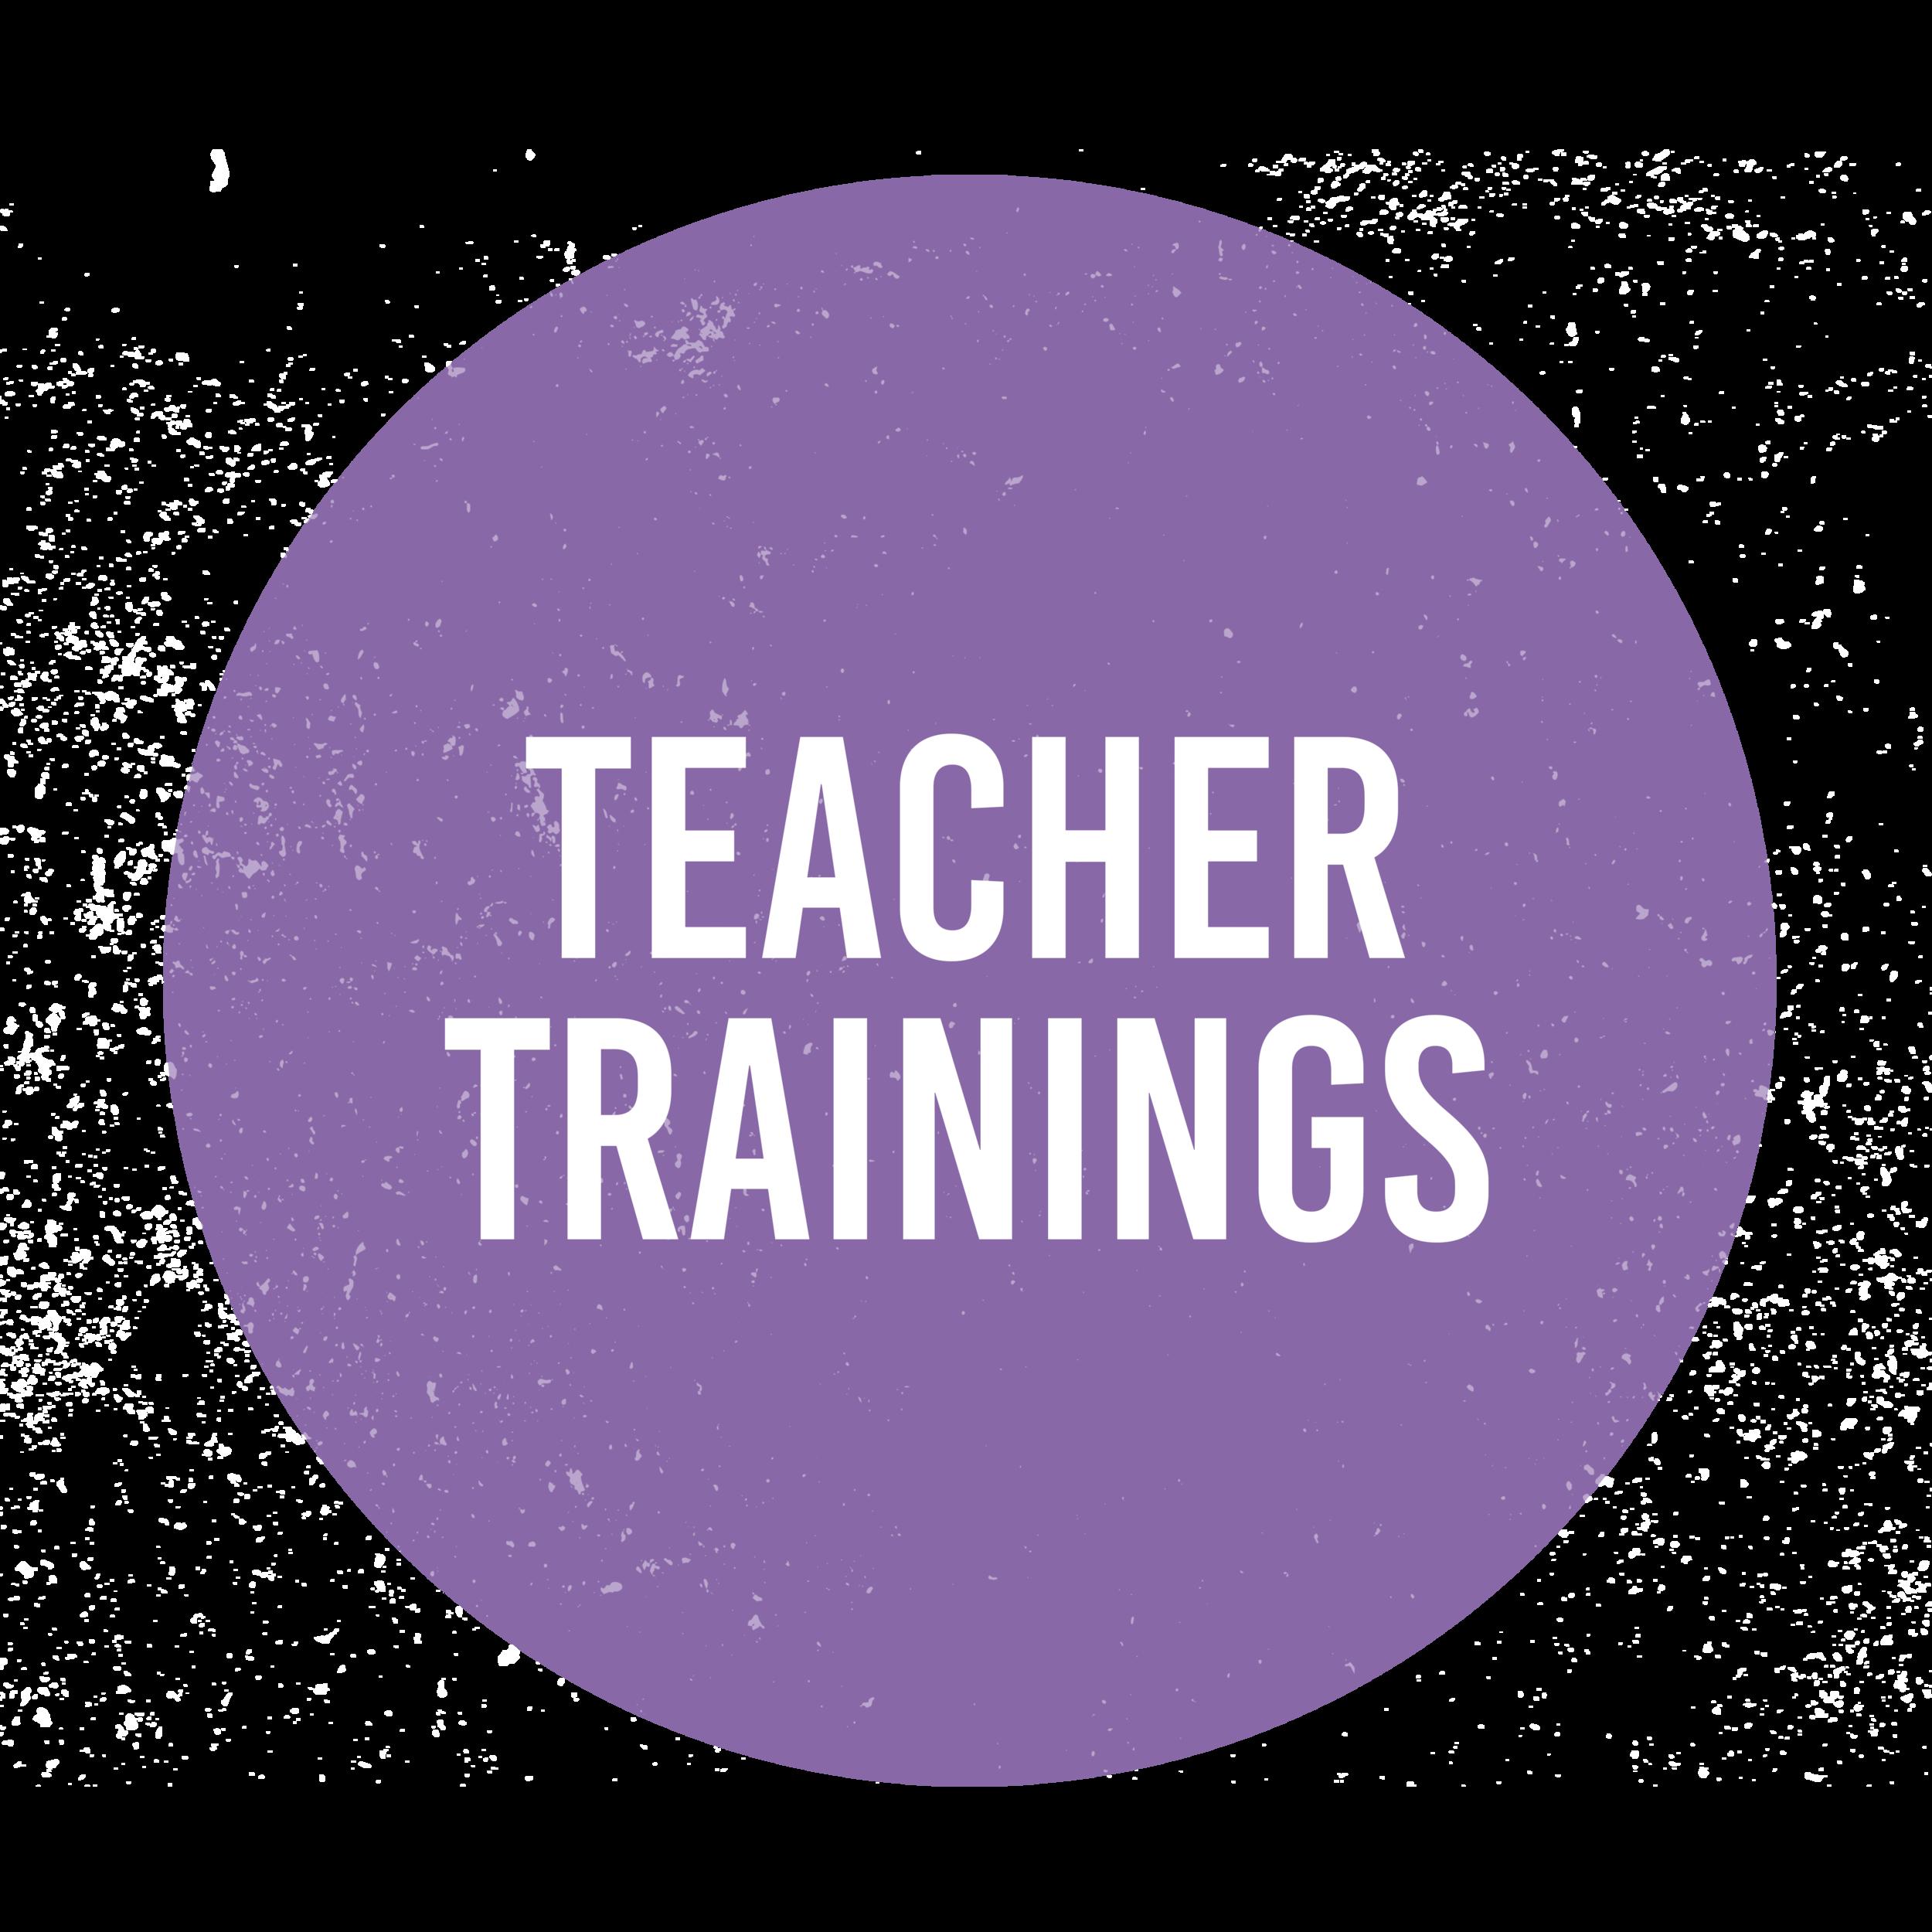 TeacherTrainingsPurpleCircle.png